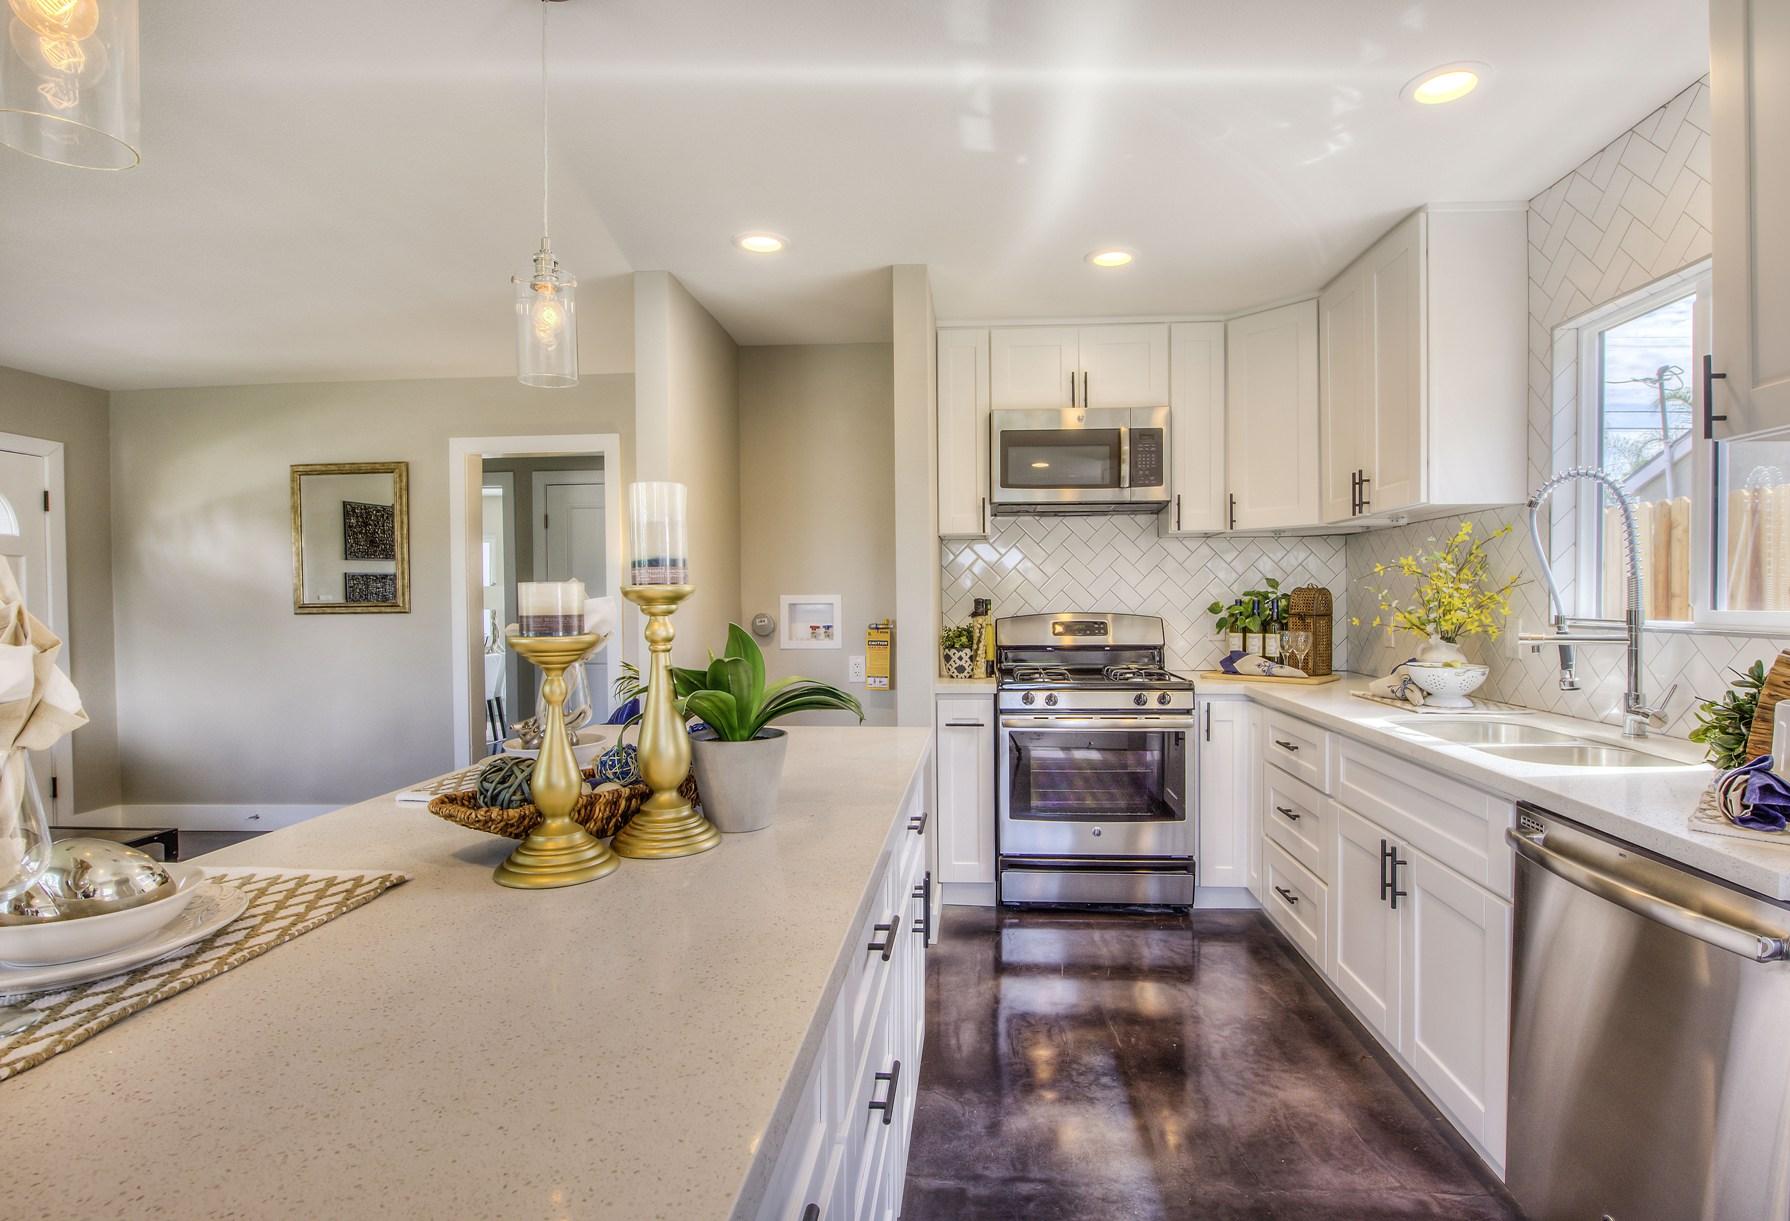 continental ave identity home staging design. Black Bedroom Furniture Sets. Home Design Ideas